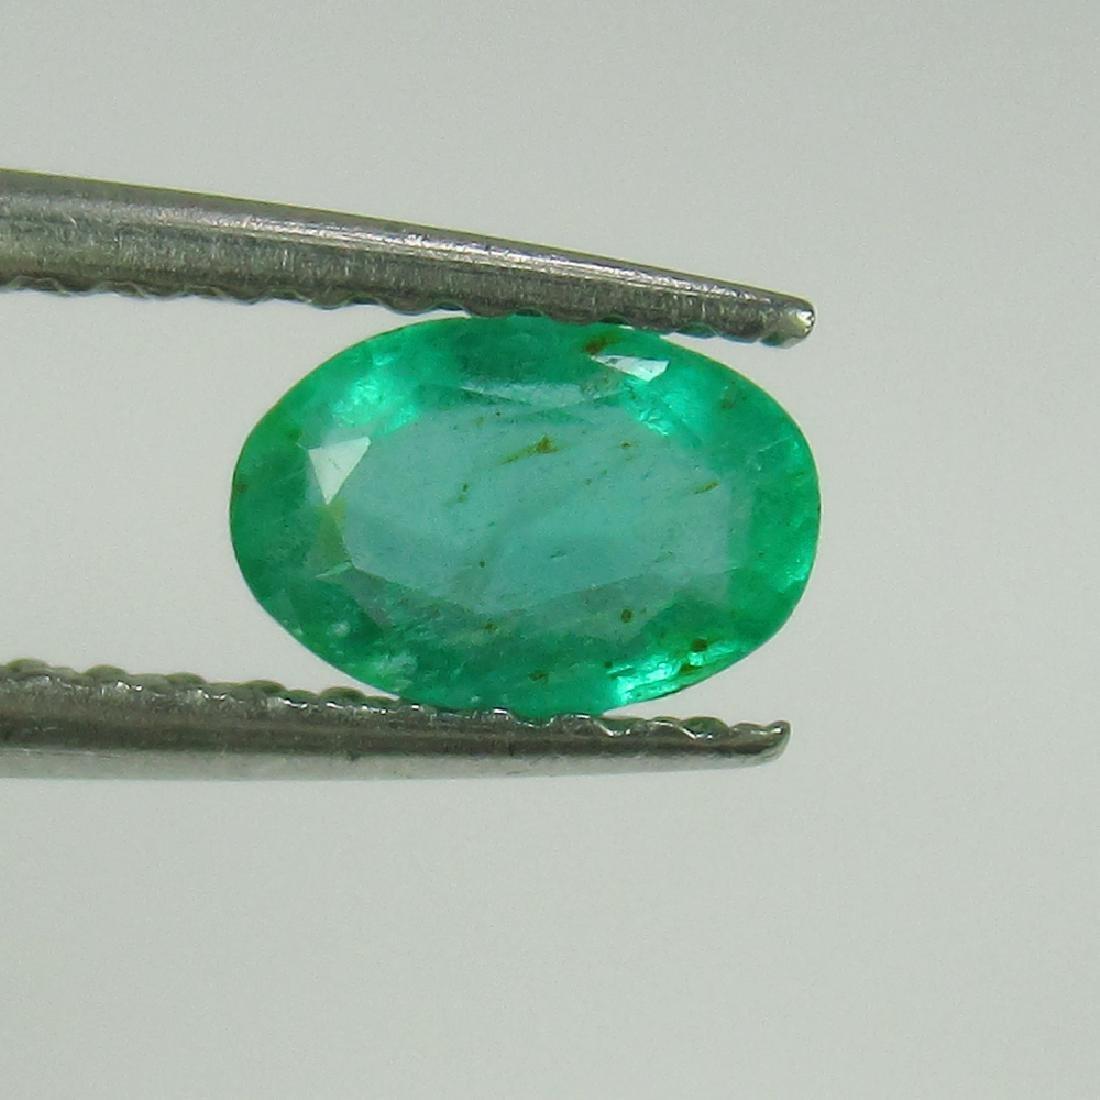 0.48 Ct Genuine Zambian Emerald Nice Oval Cut